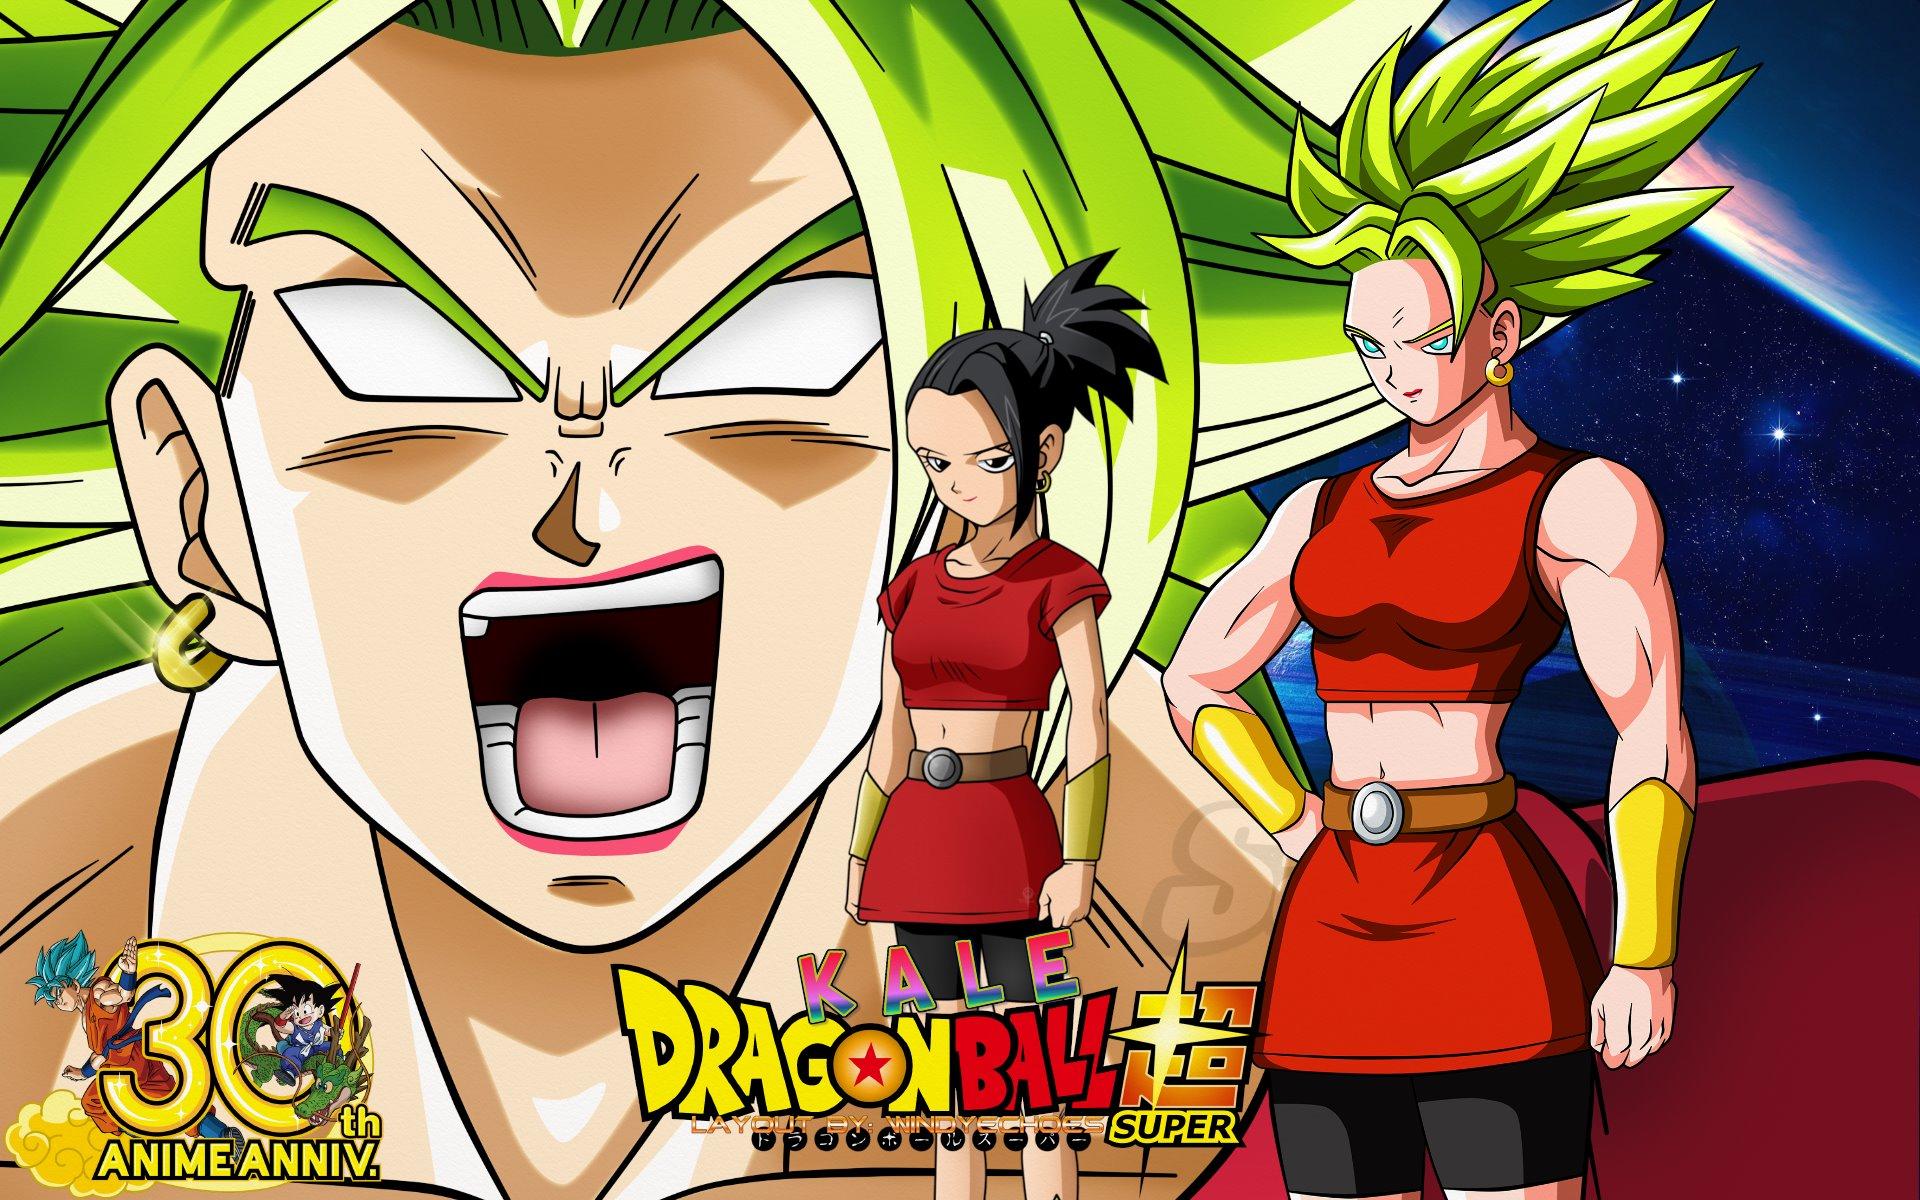 Dragon Ball Super Kale Super Saiyan Berserk Silk poster wallpaper 24 X 13 inches